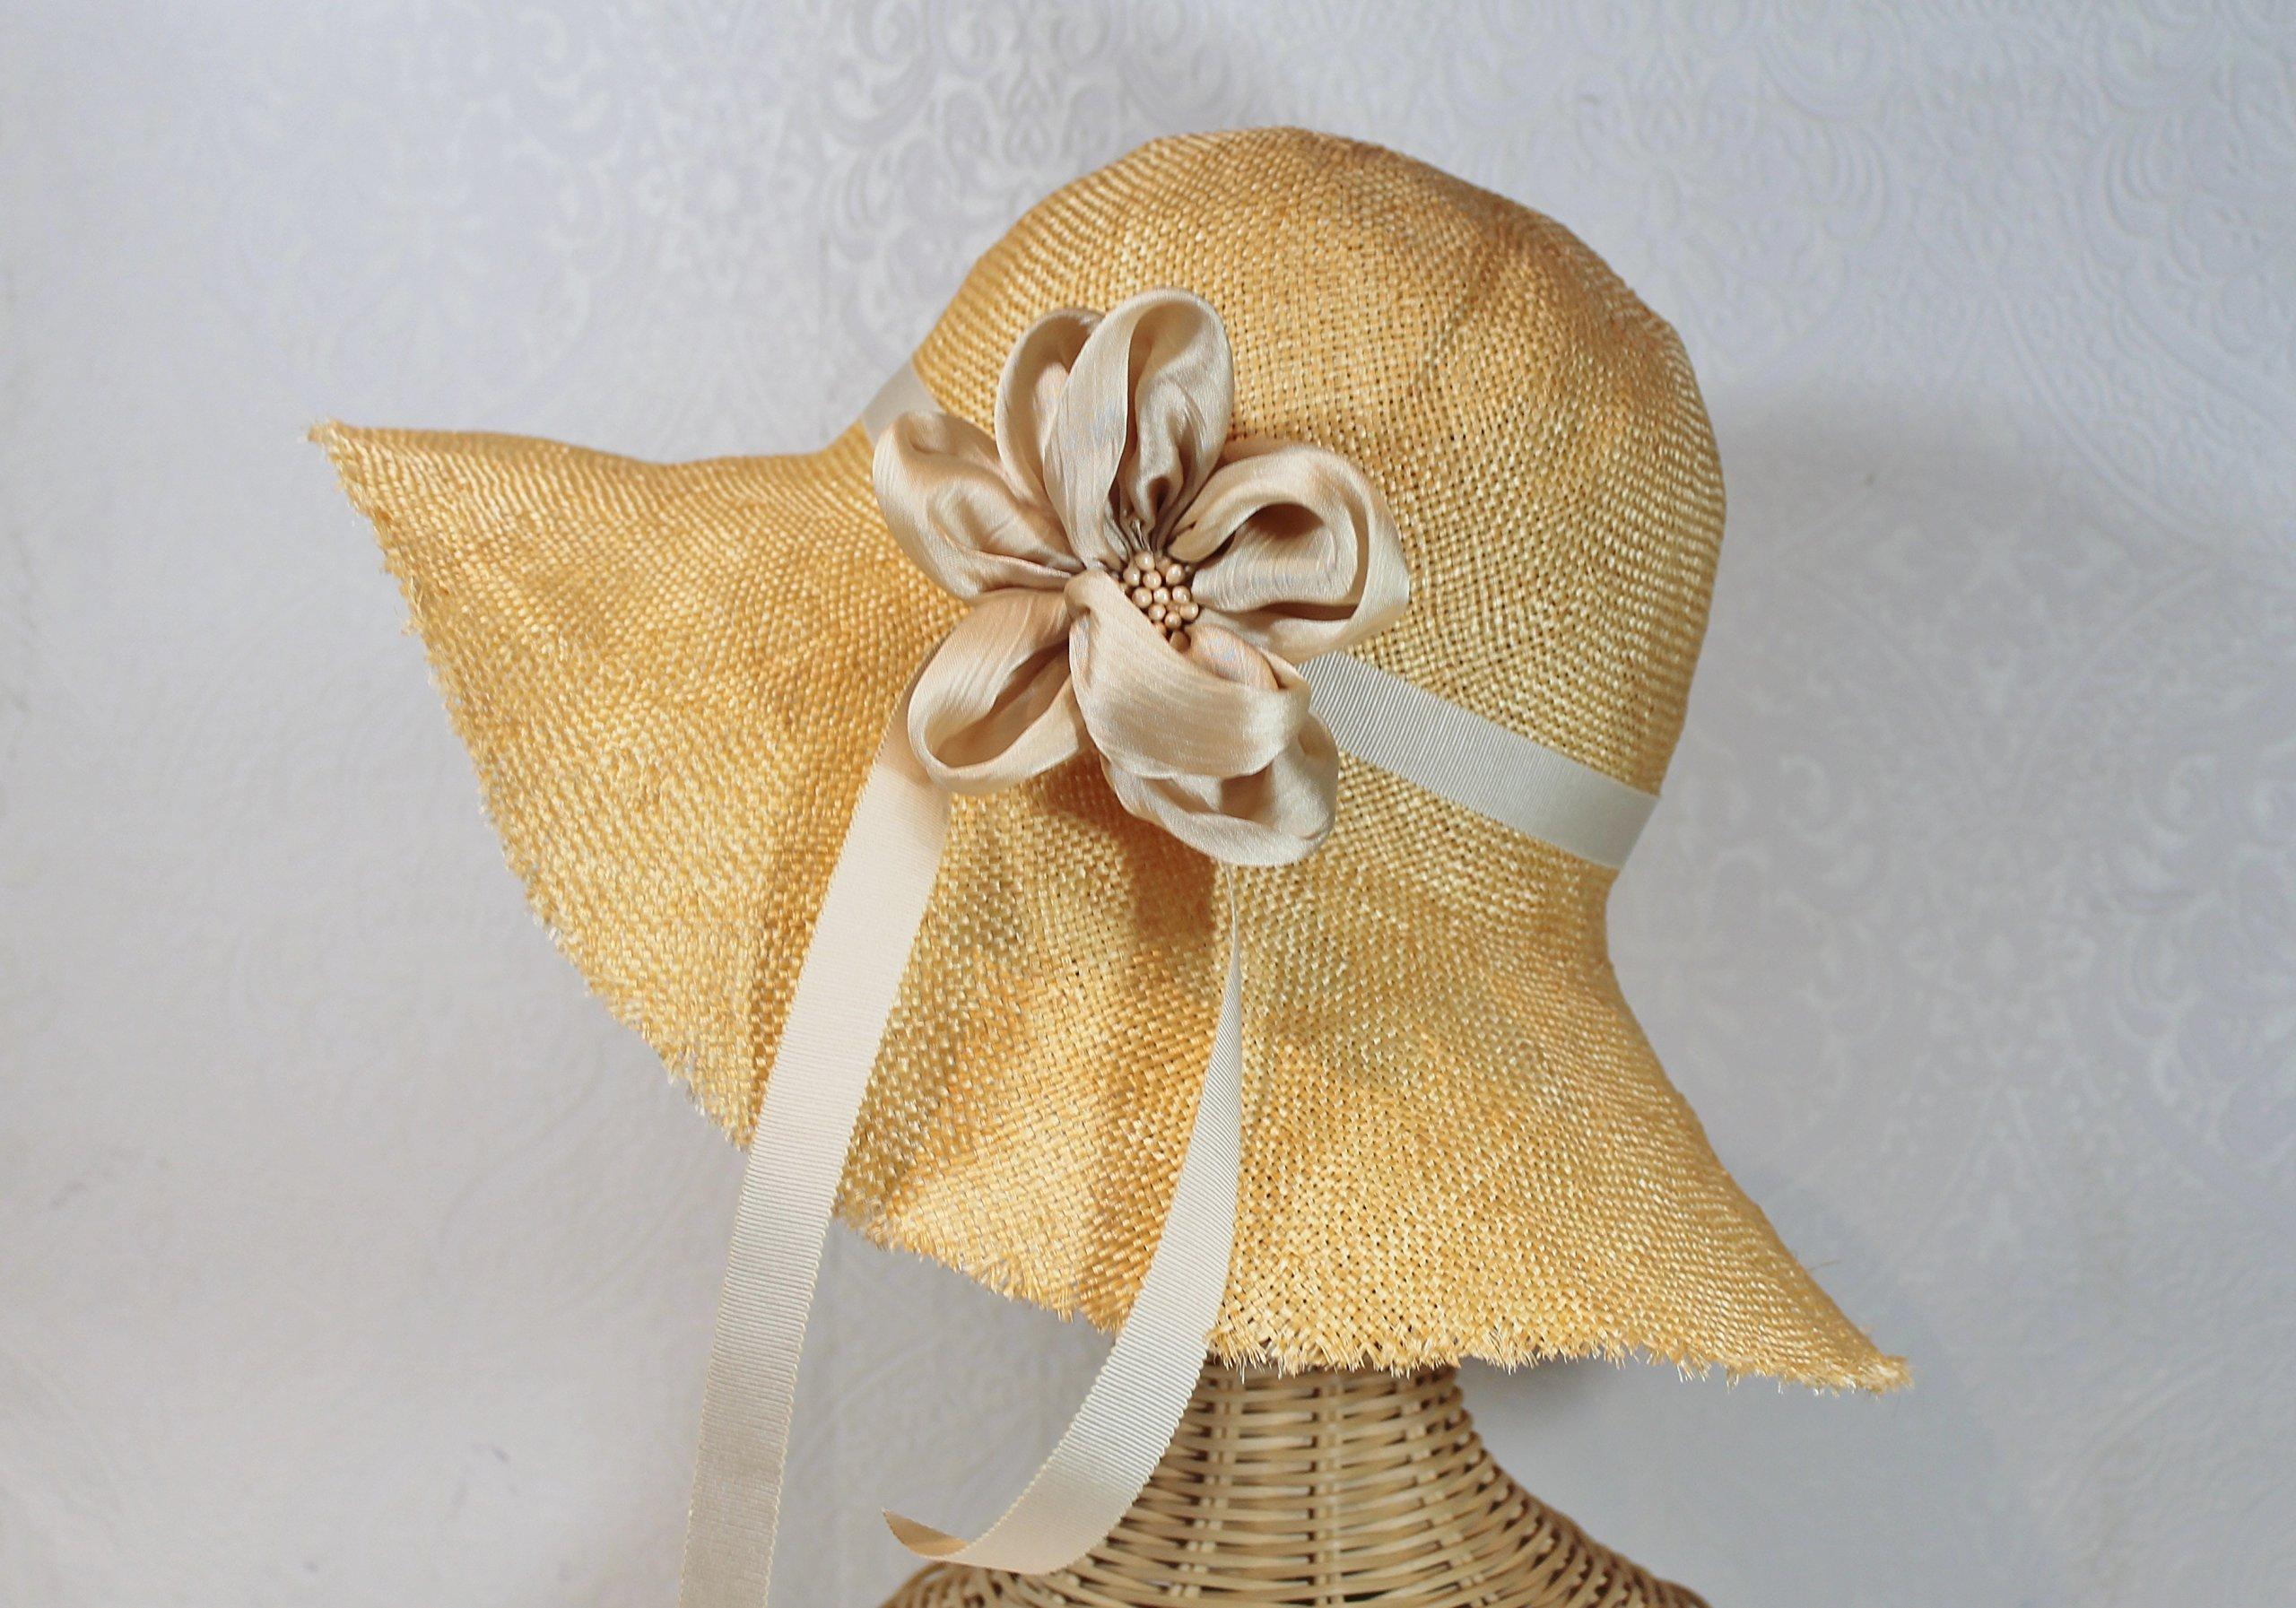 Lyla Frayed Edge Straw Derby Sunhat in Marigold Yellow